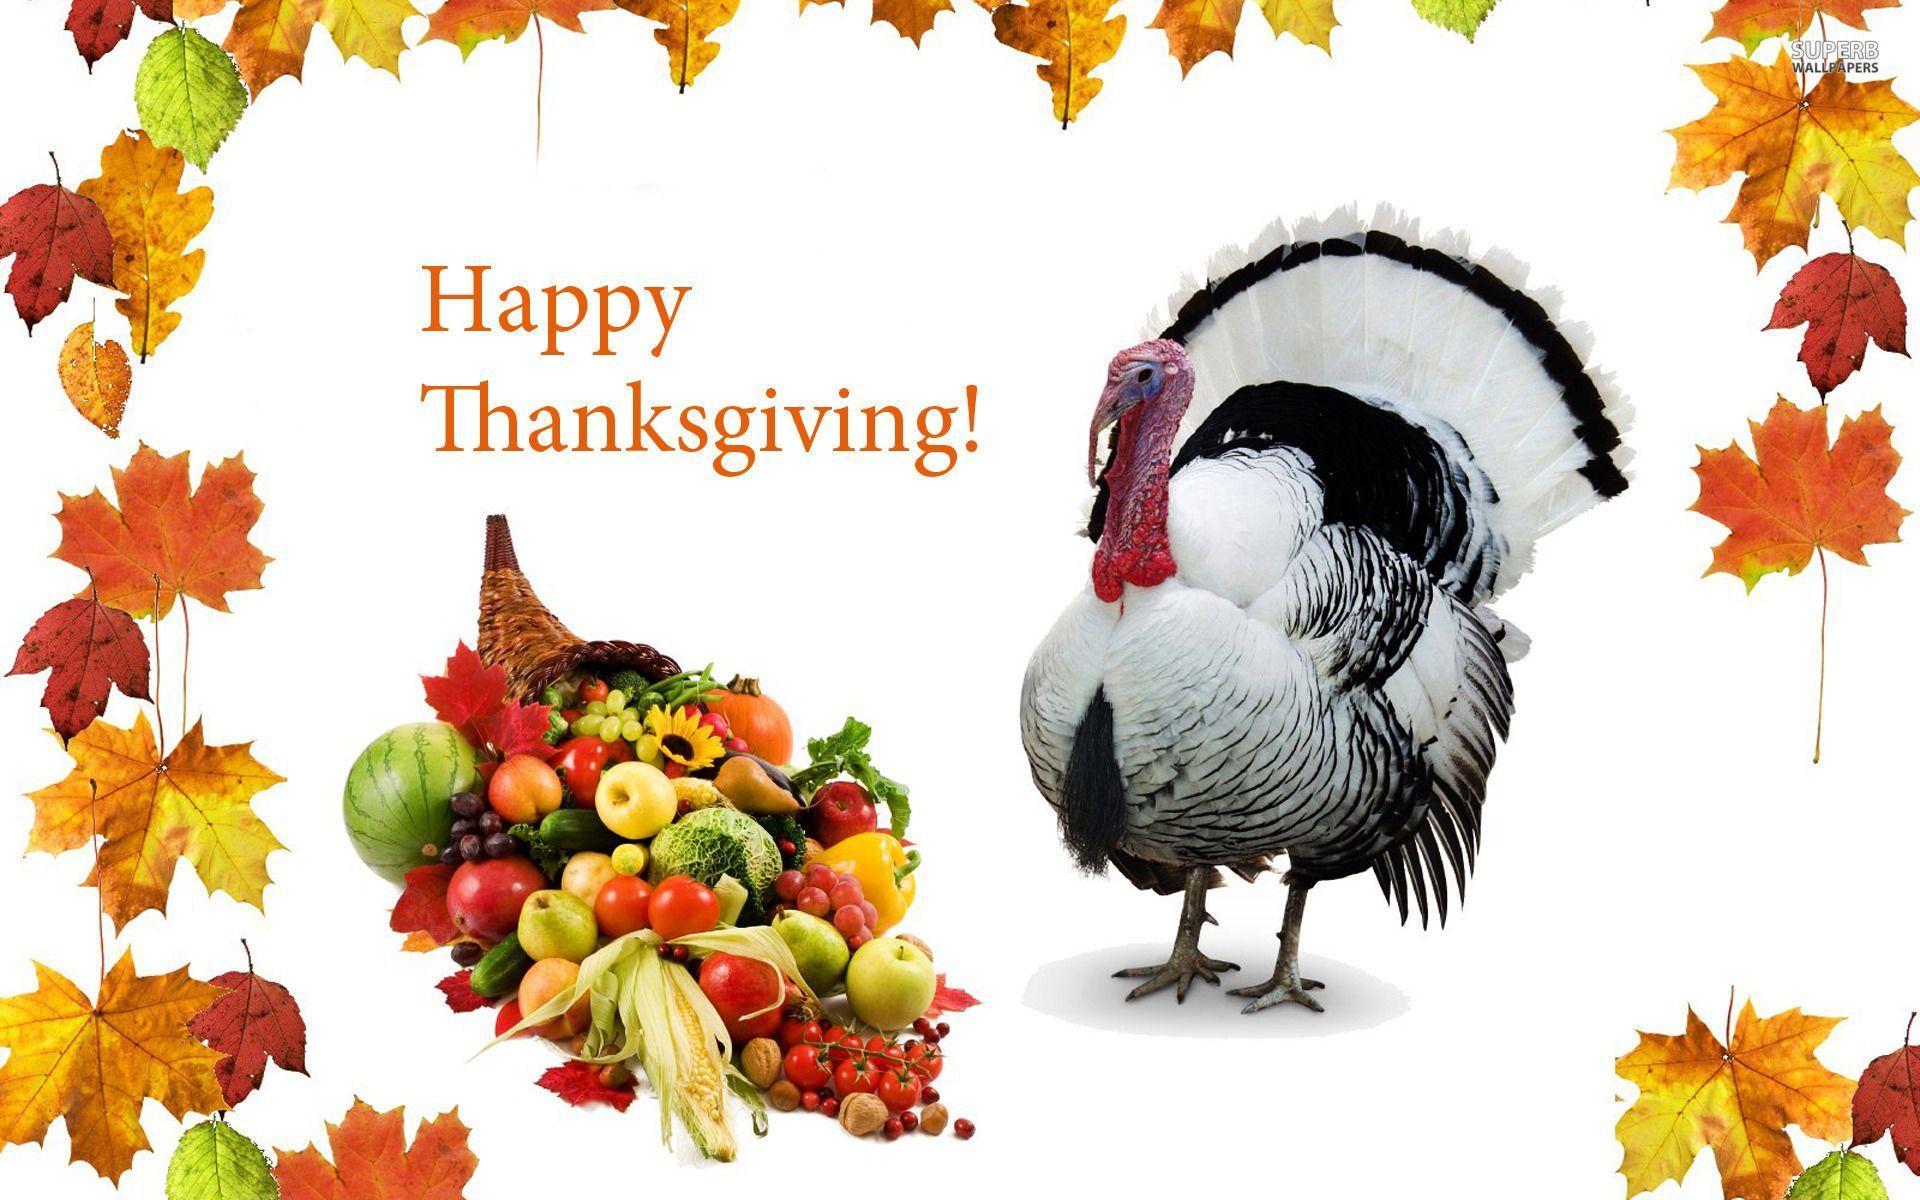 Happy Thanksgiving Computer Wallpaper